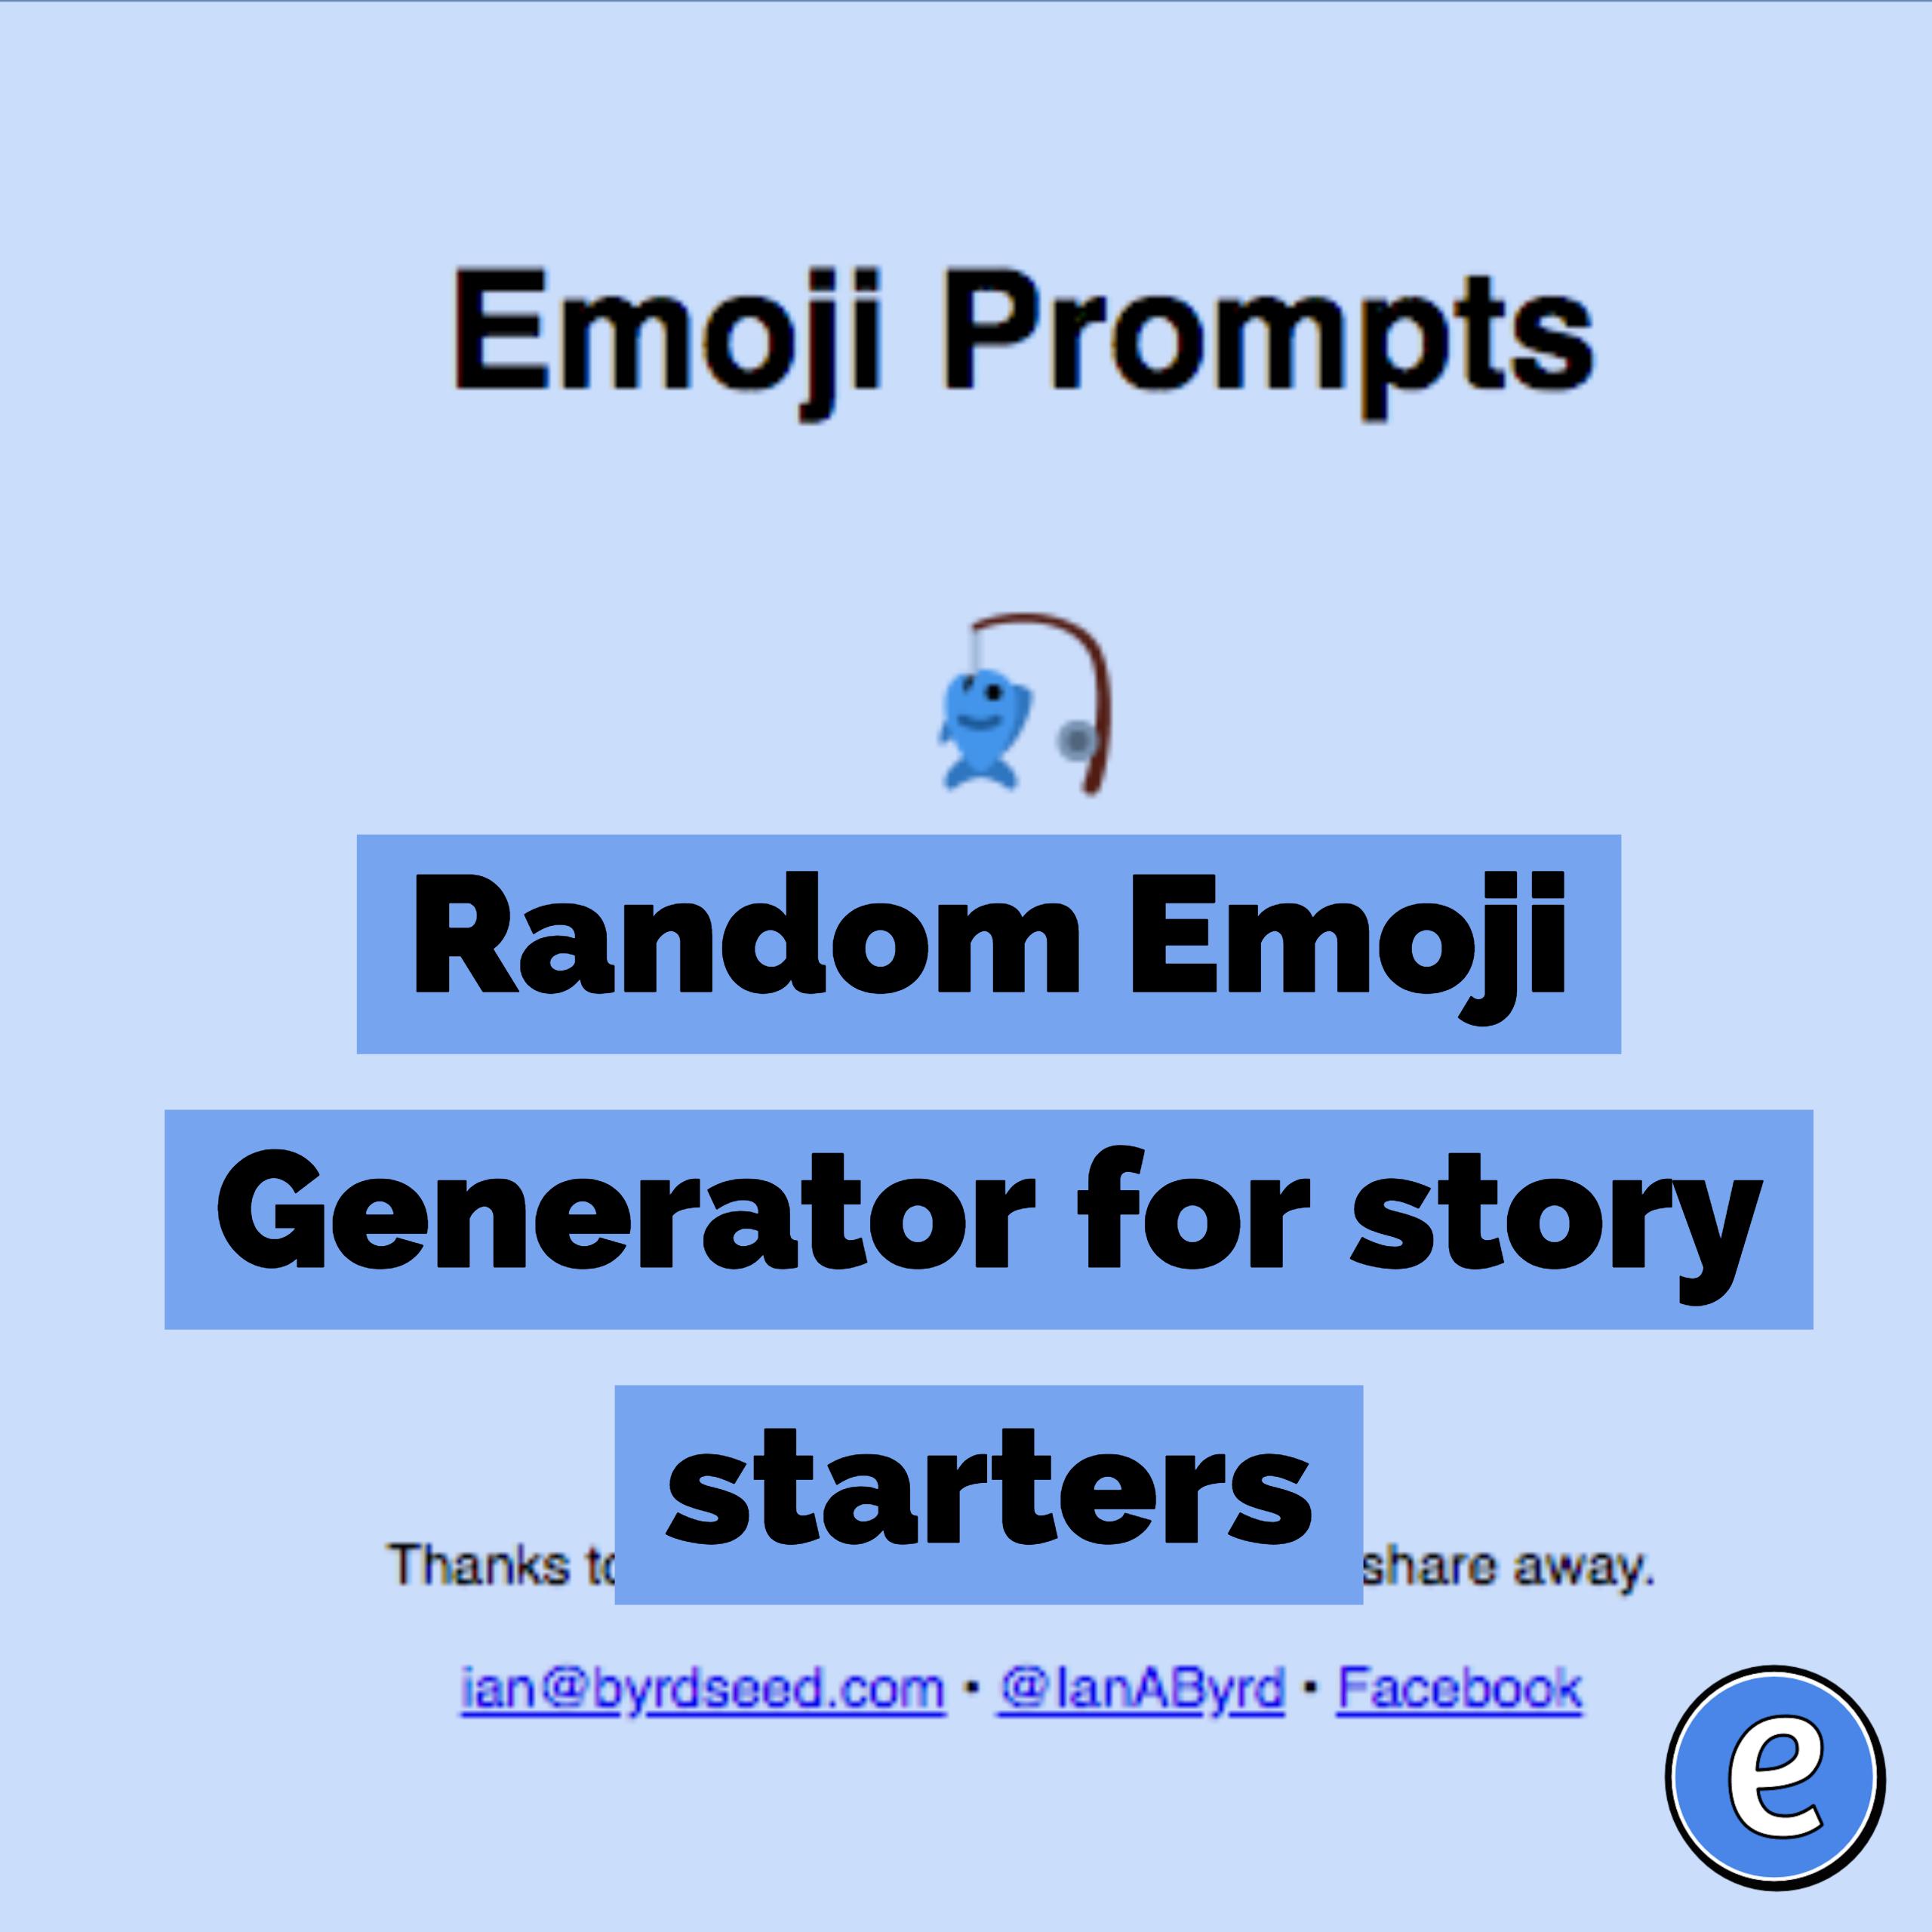 Random Emoji Generator for story starters - #Eduk8me